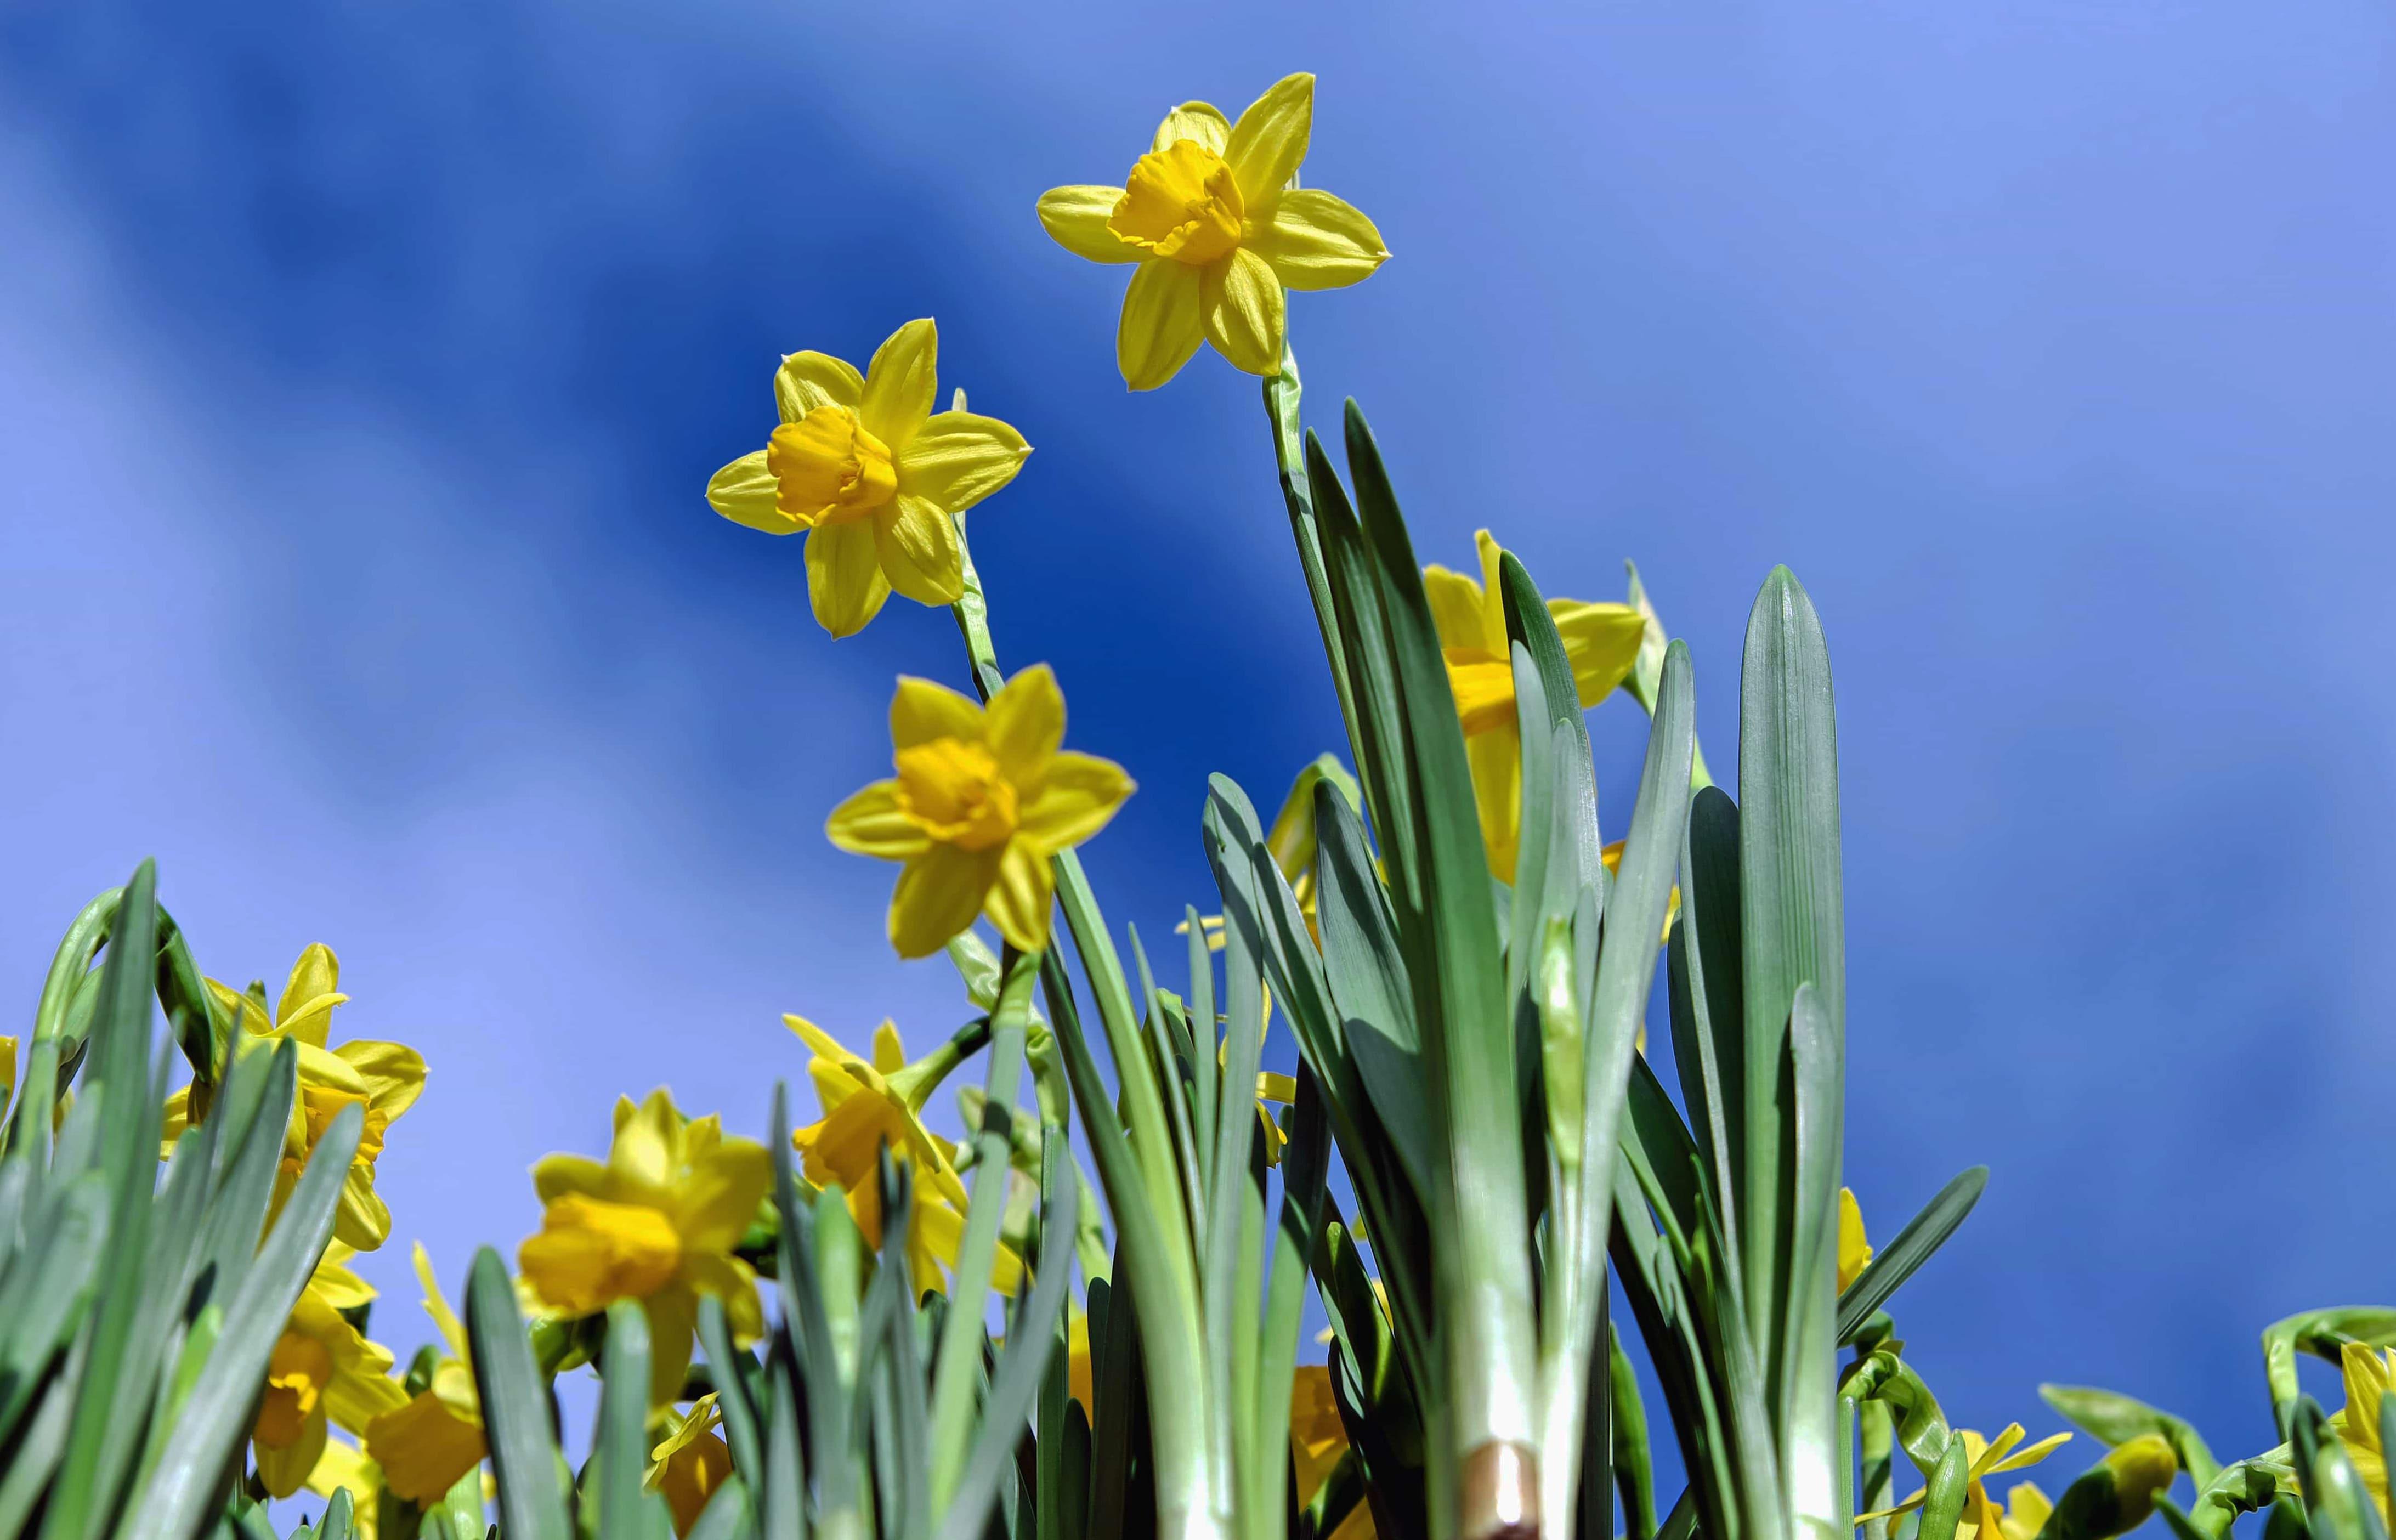 daffodils-photo-14